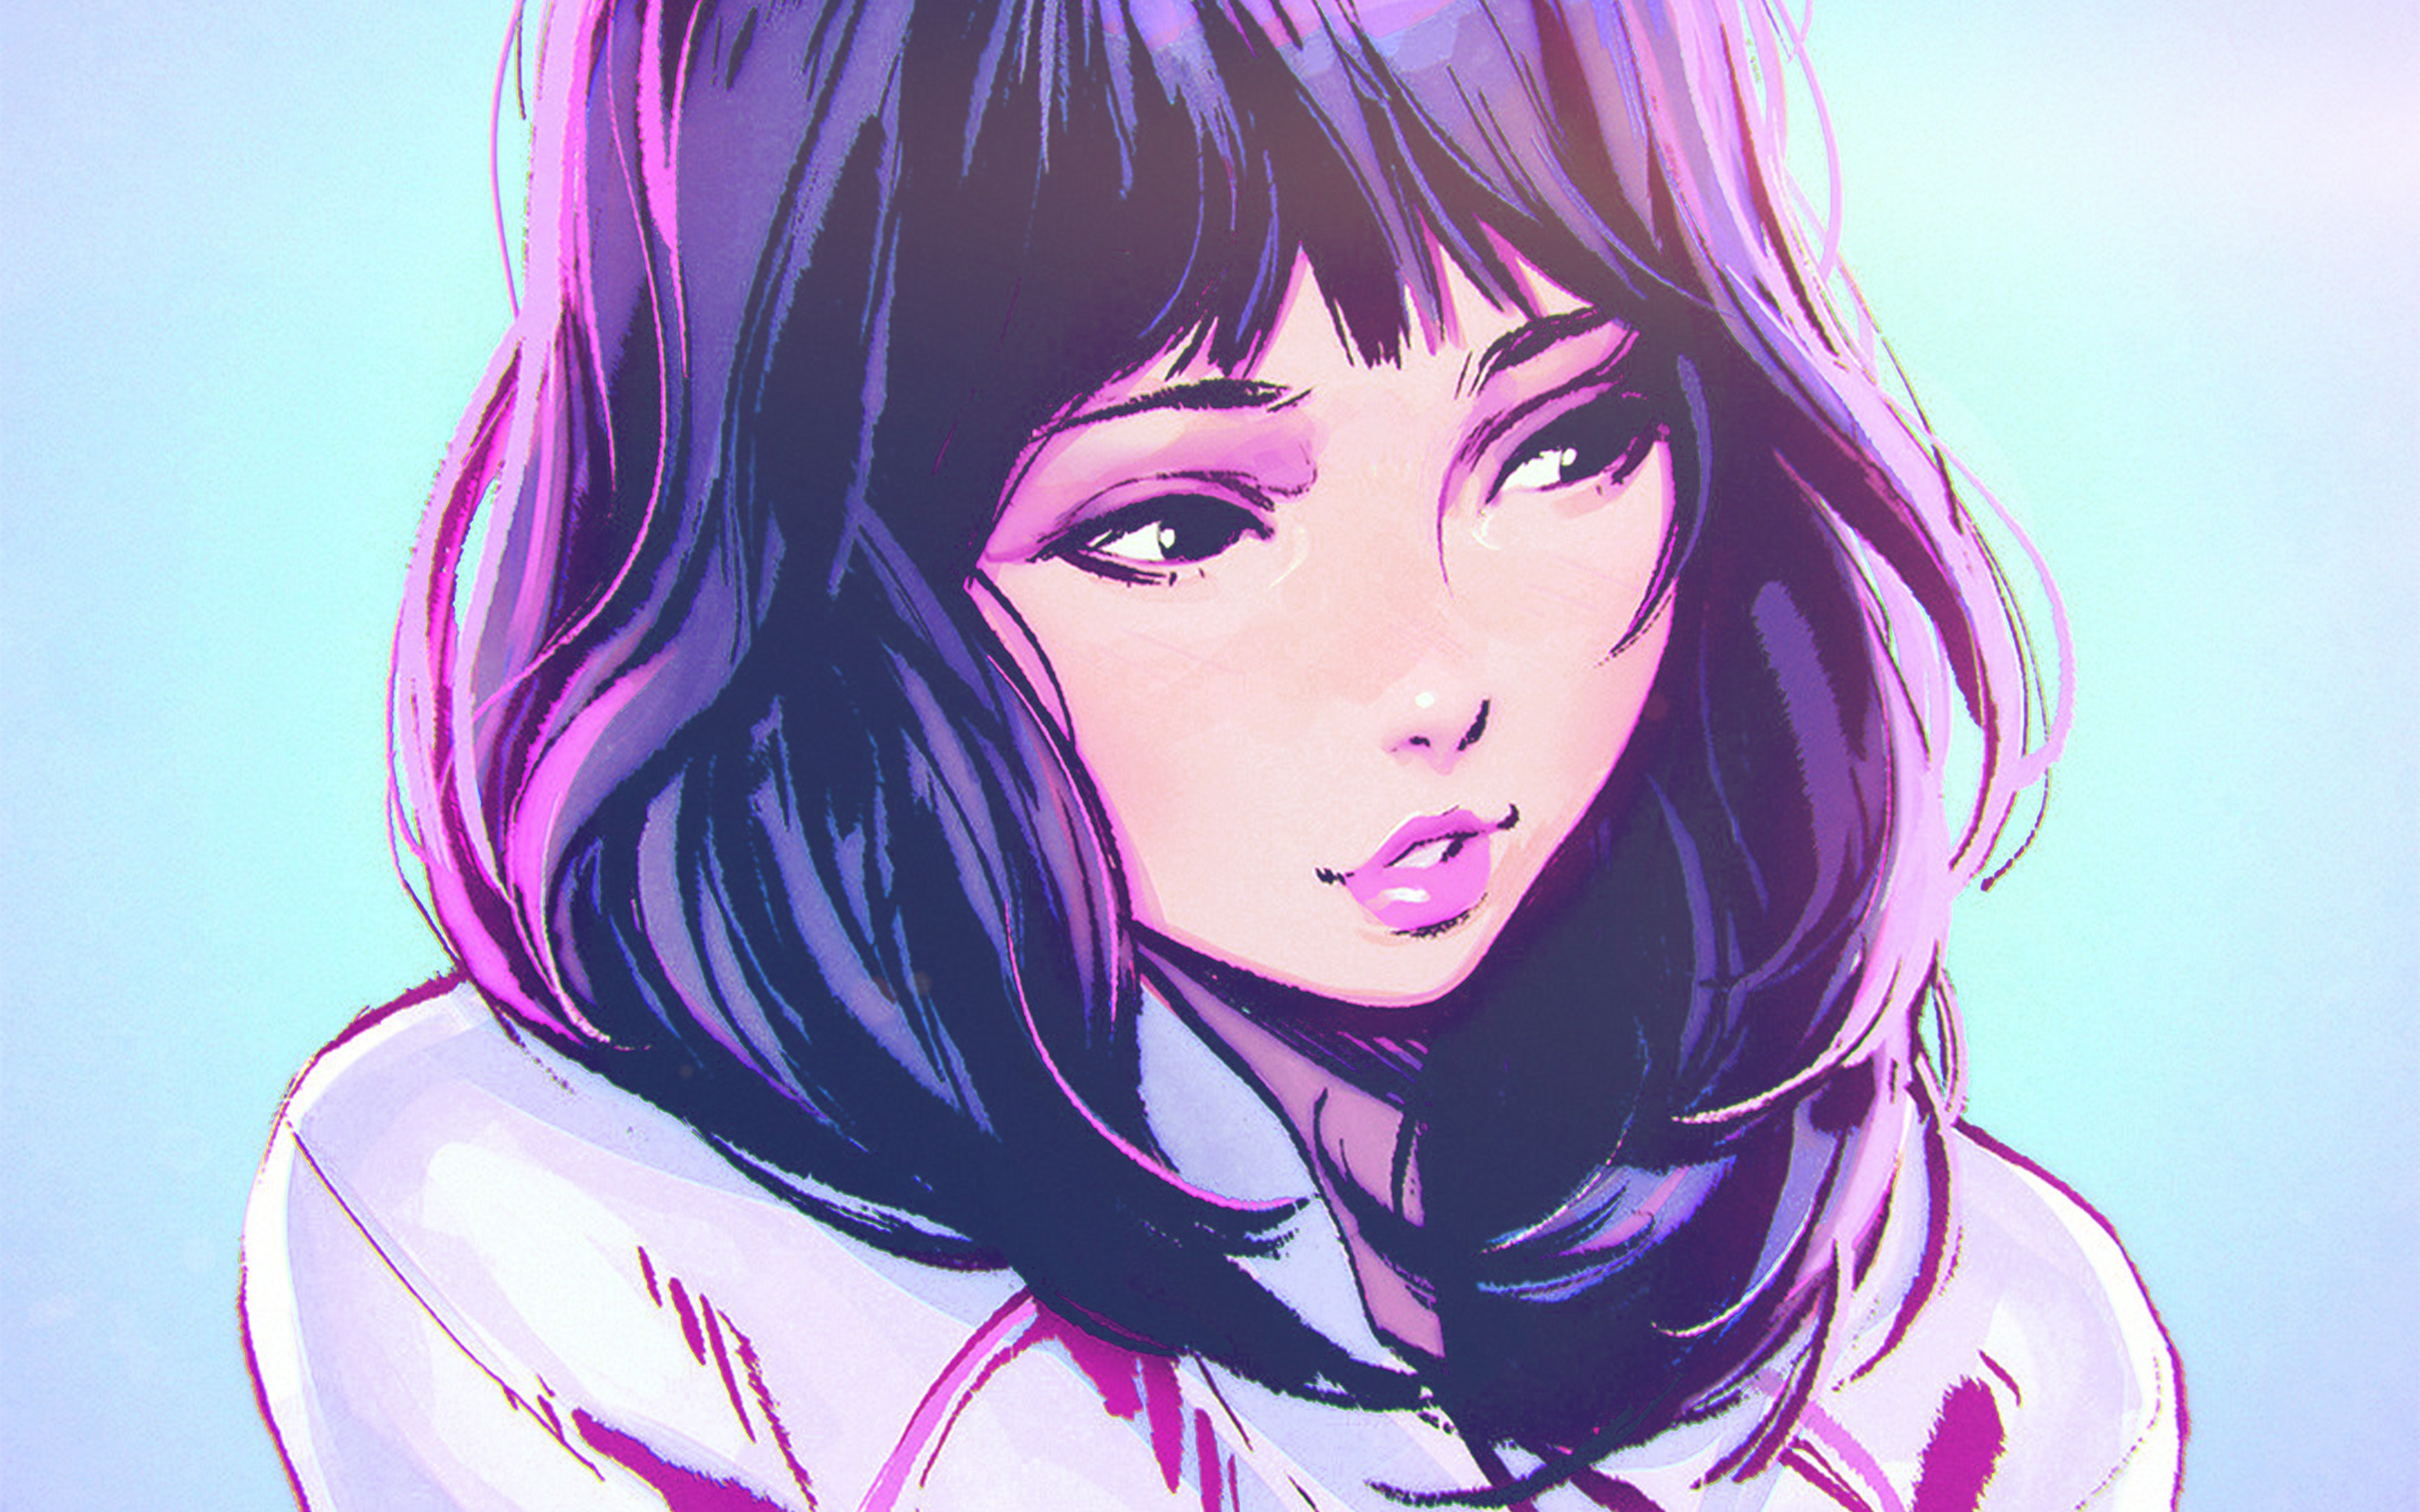 Aw58-ilya-kuvshinov-girl-blue-face-illustration-art-wallpaper